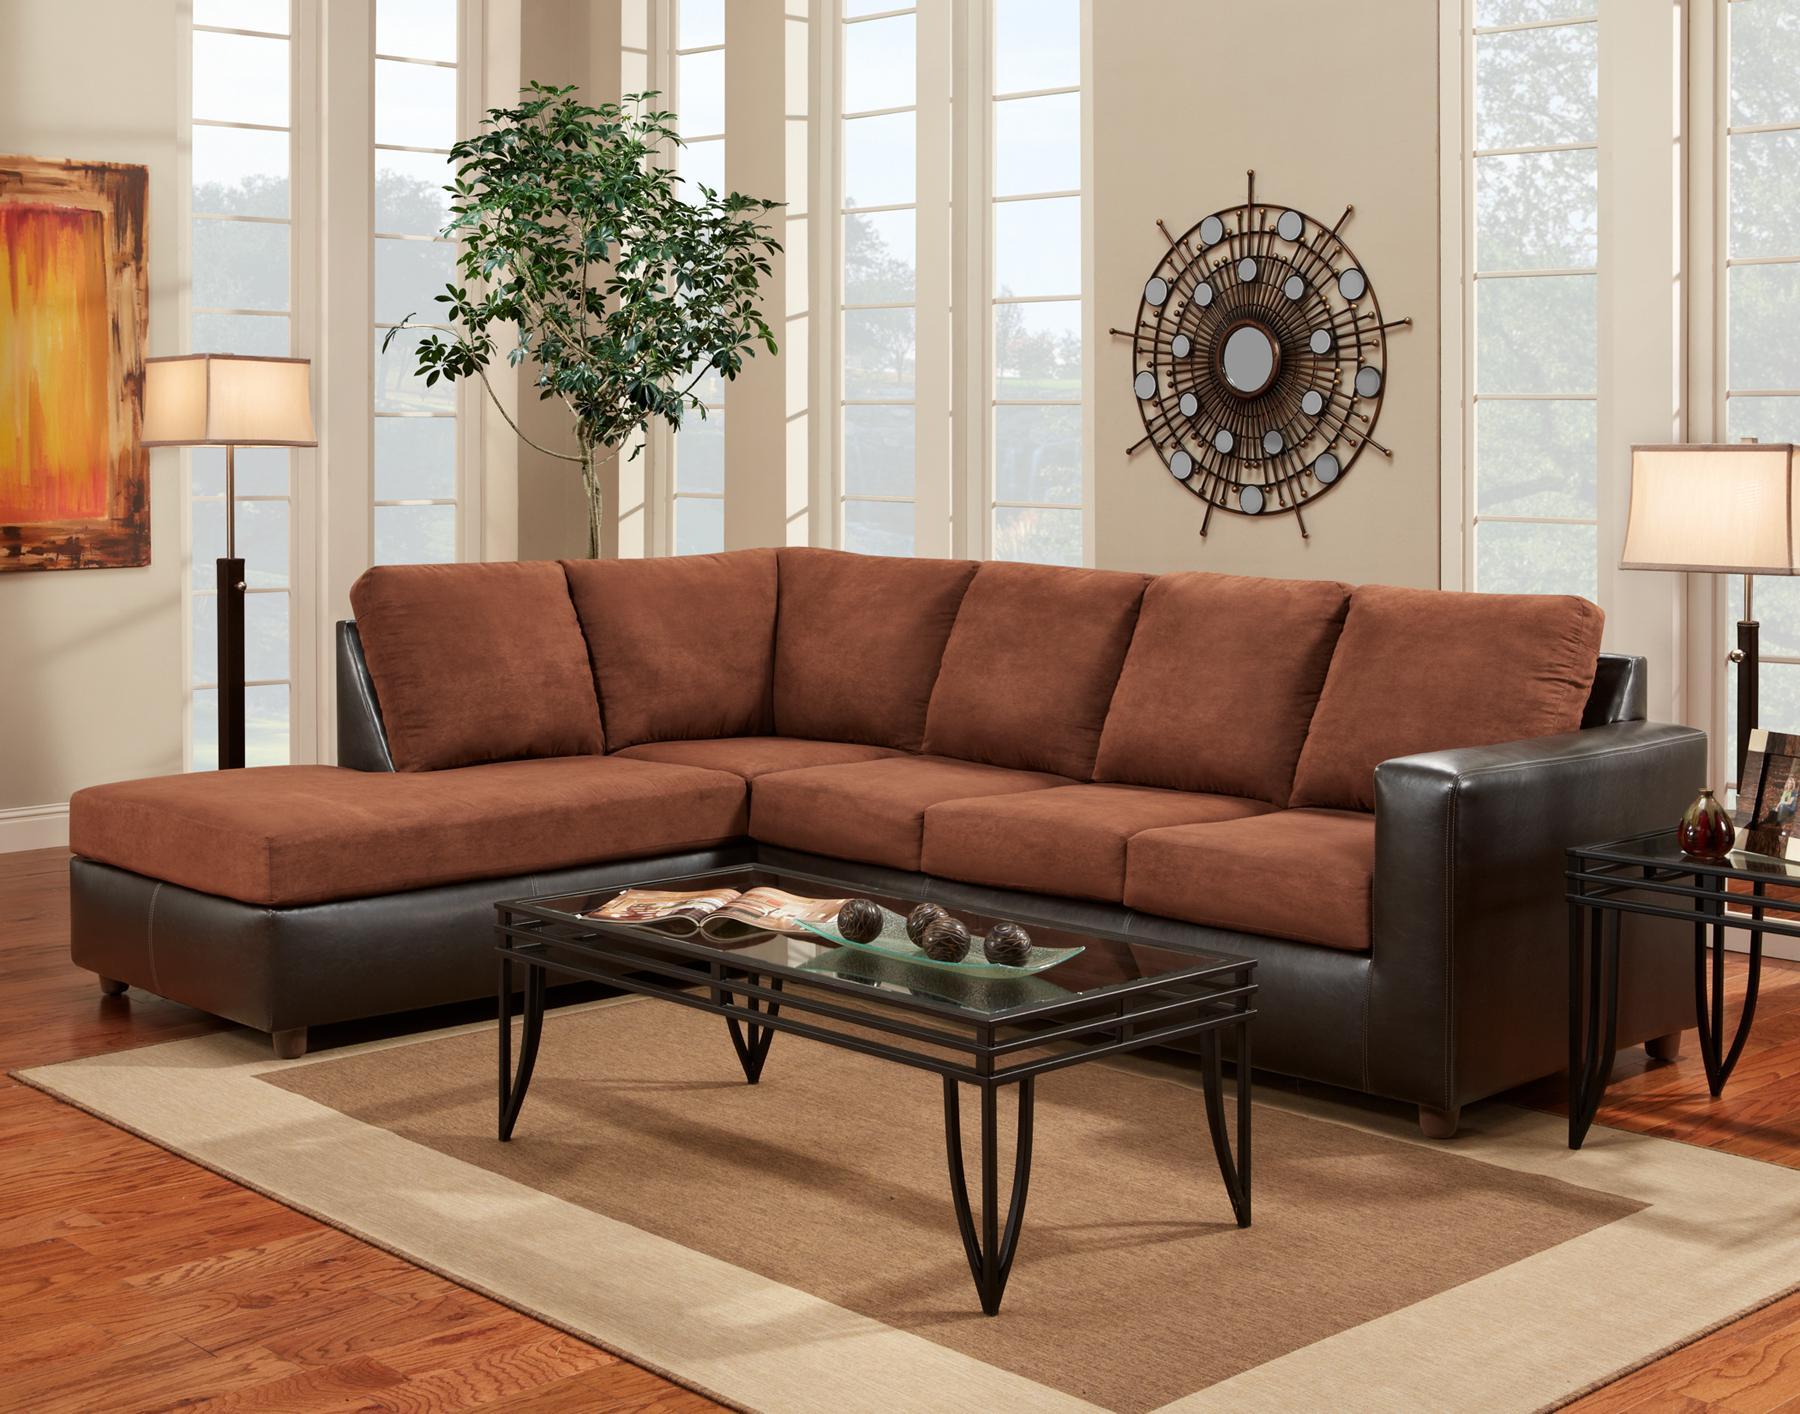 Marshall, TX Furniture Store Ivan Smith Furniture U2013 Marshall, TX